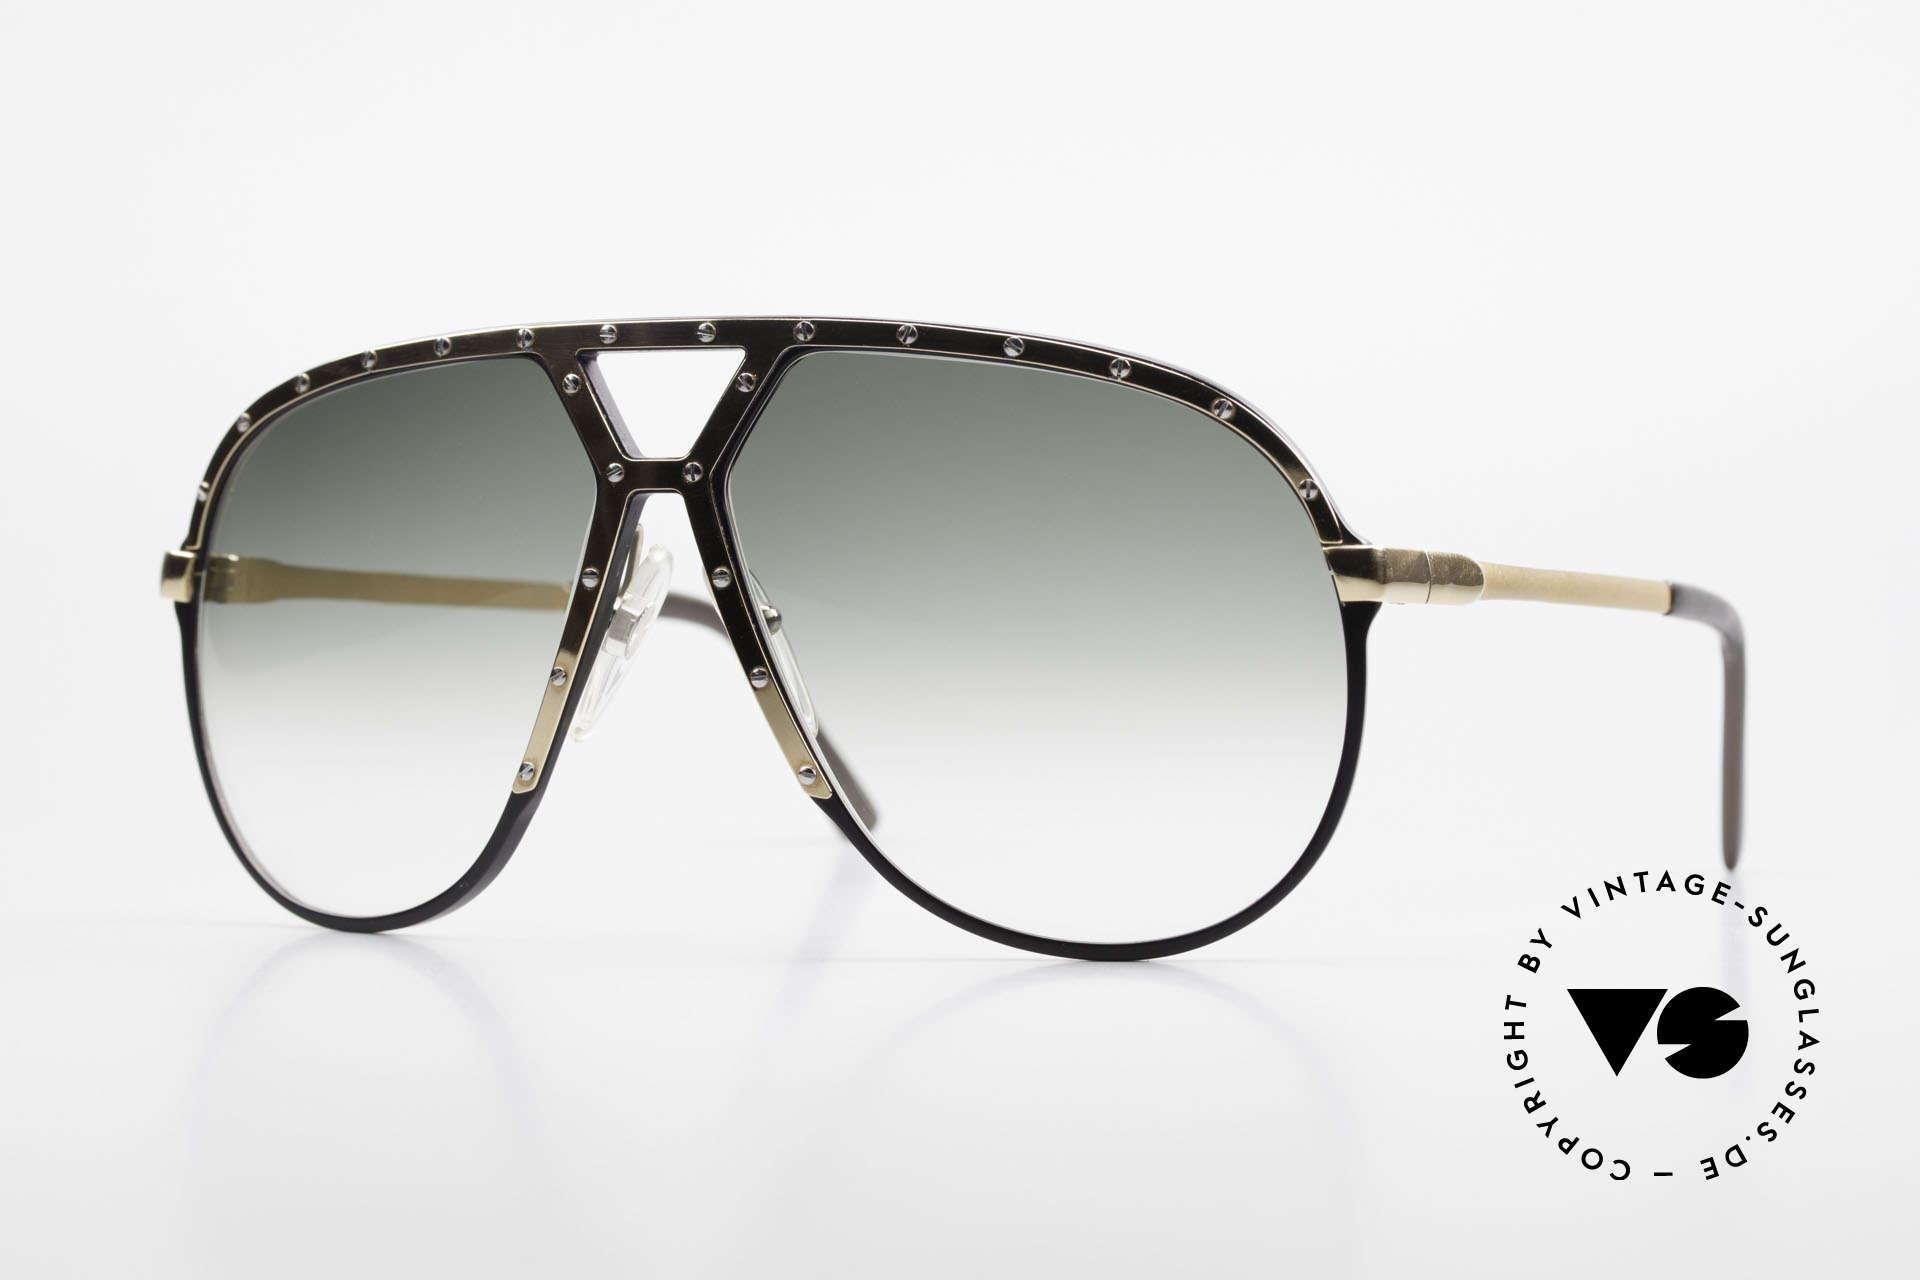 Alpina M1 80er Sonnenbrille W Germany, alte Alpina M1 80er WEST GERMANY Sonnenbrille, Passend für Herren